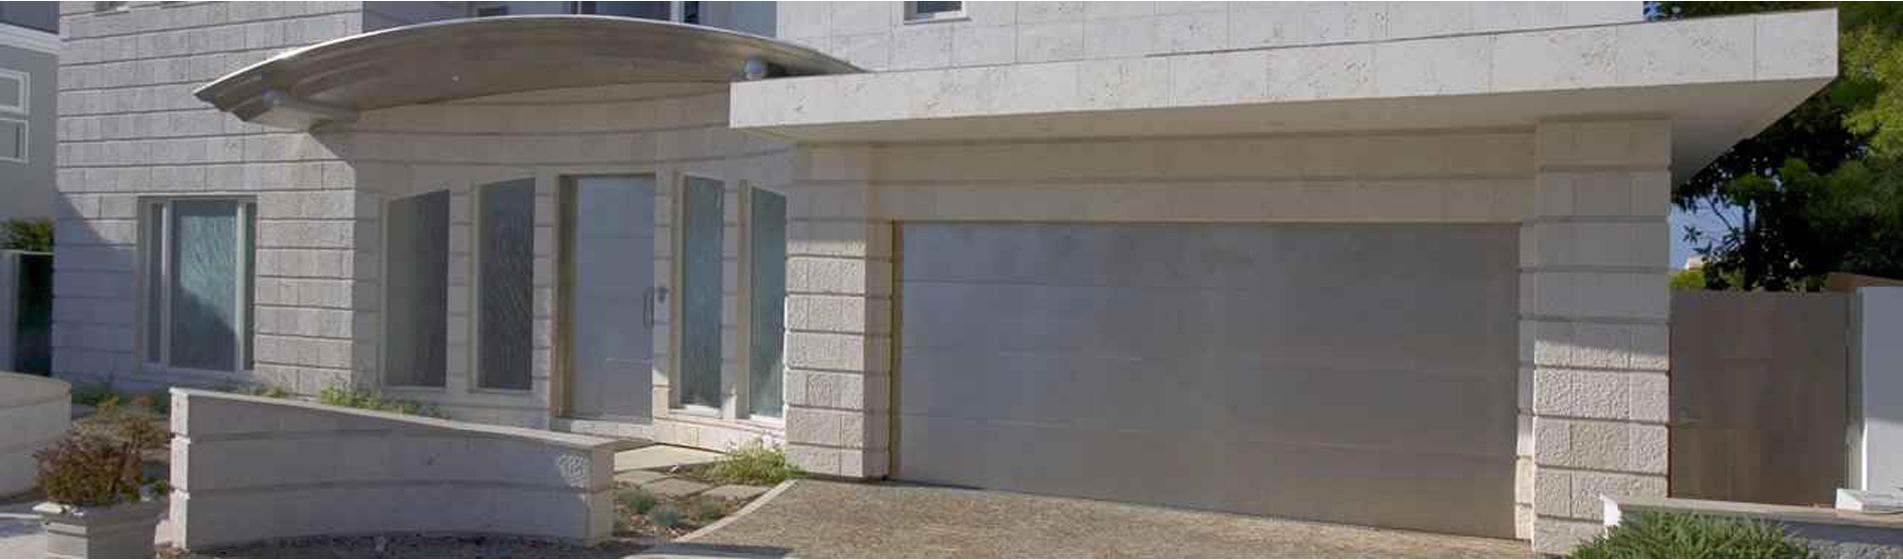 prix porte de garage avec portillon Pertuis